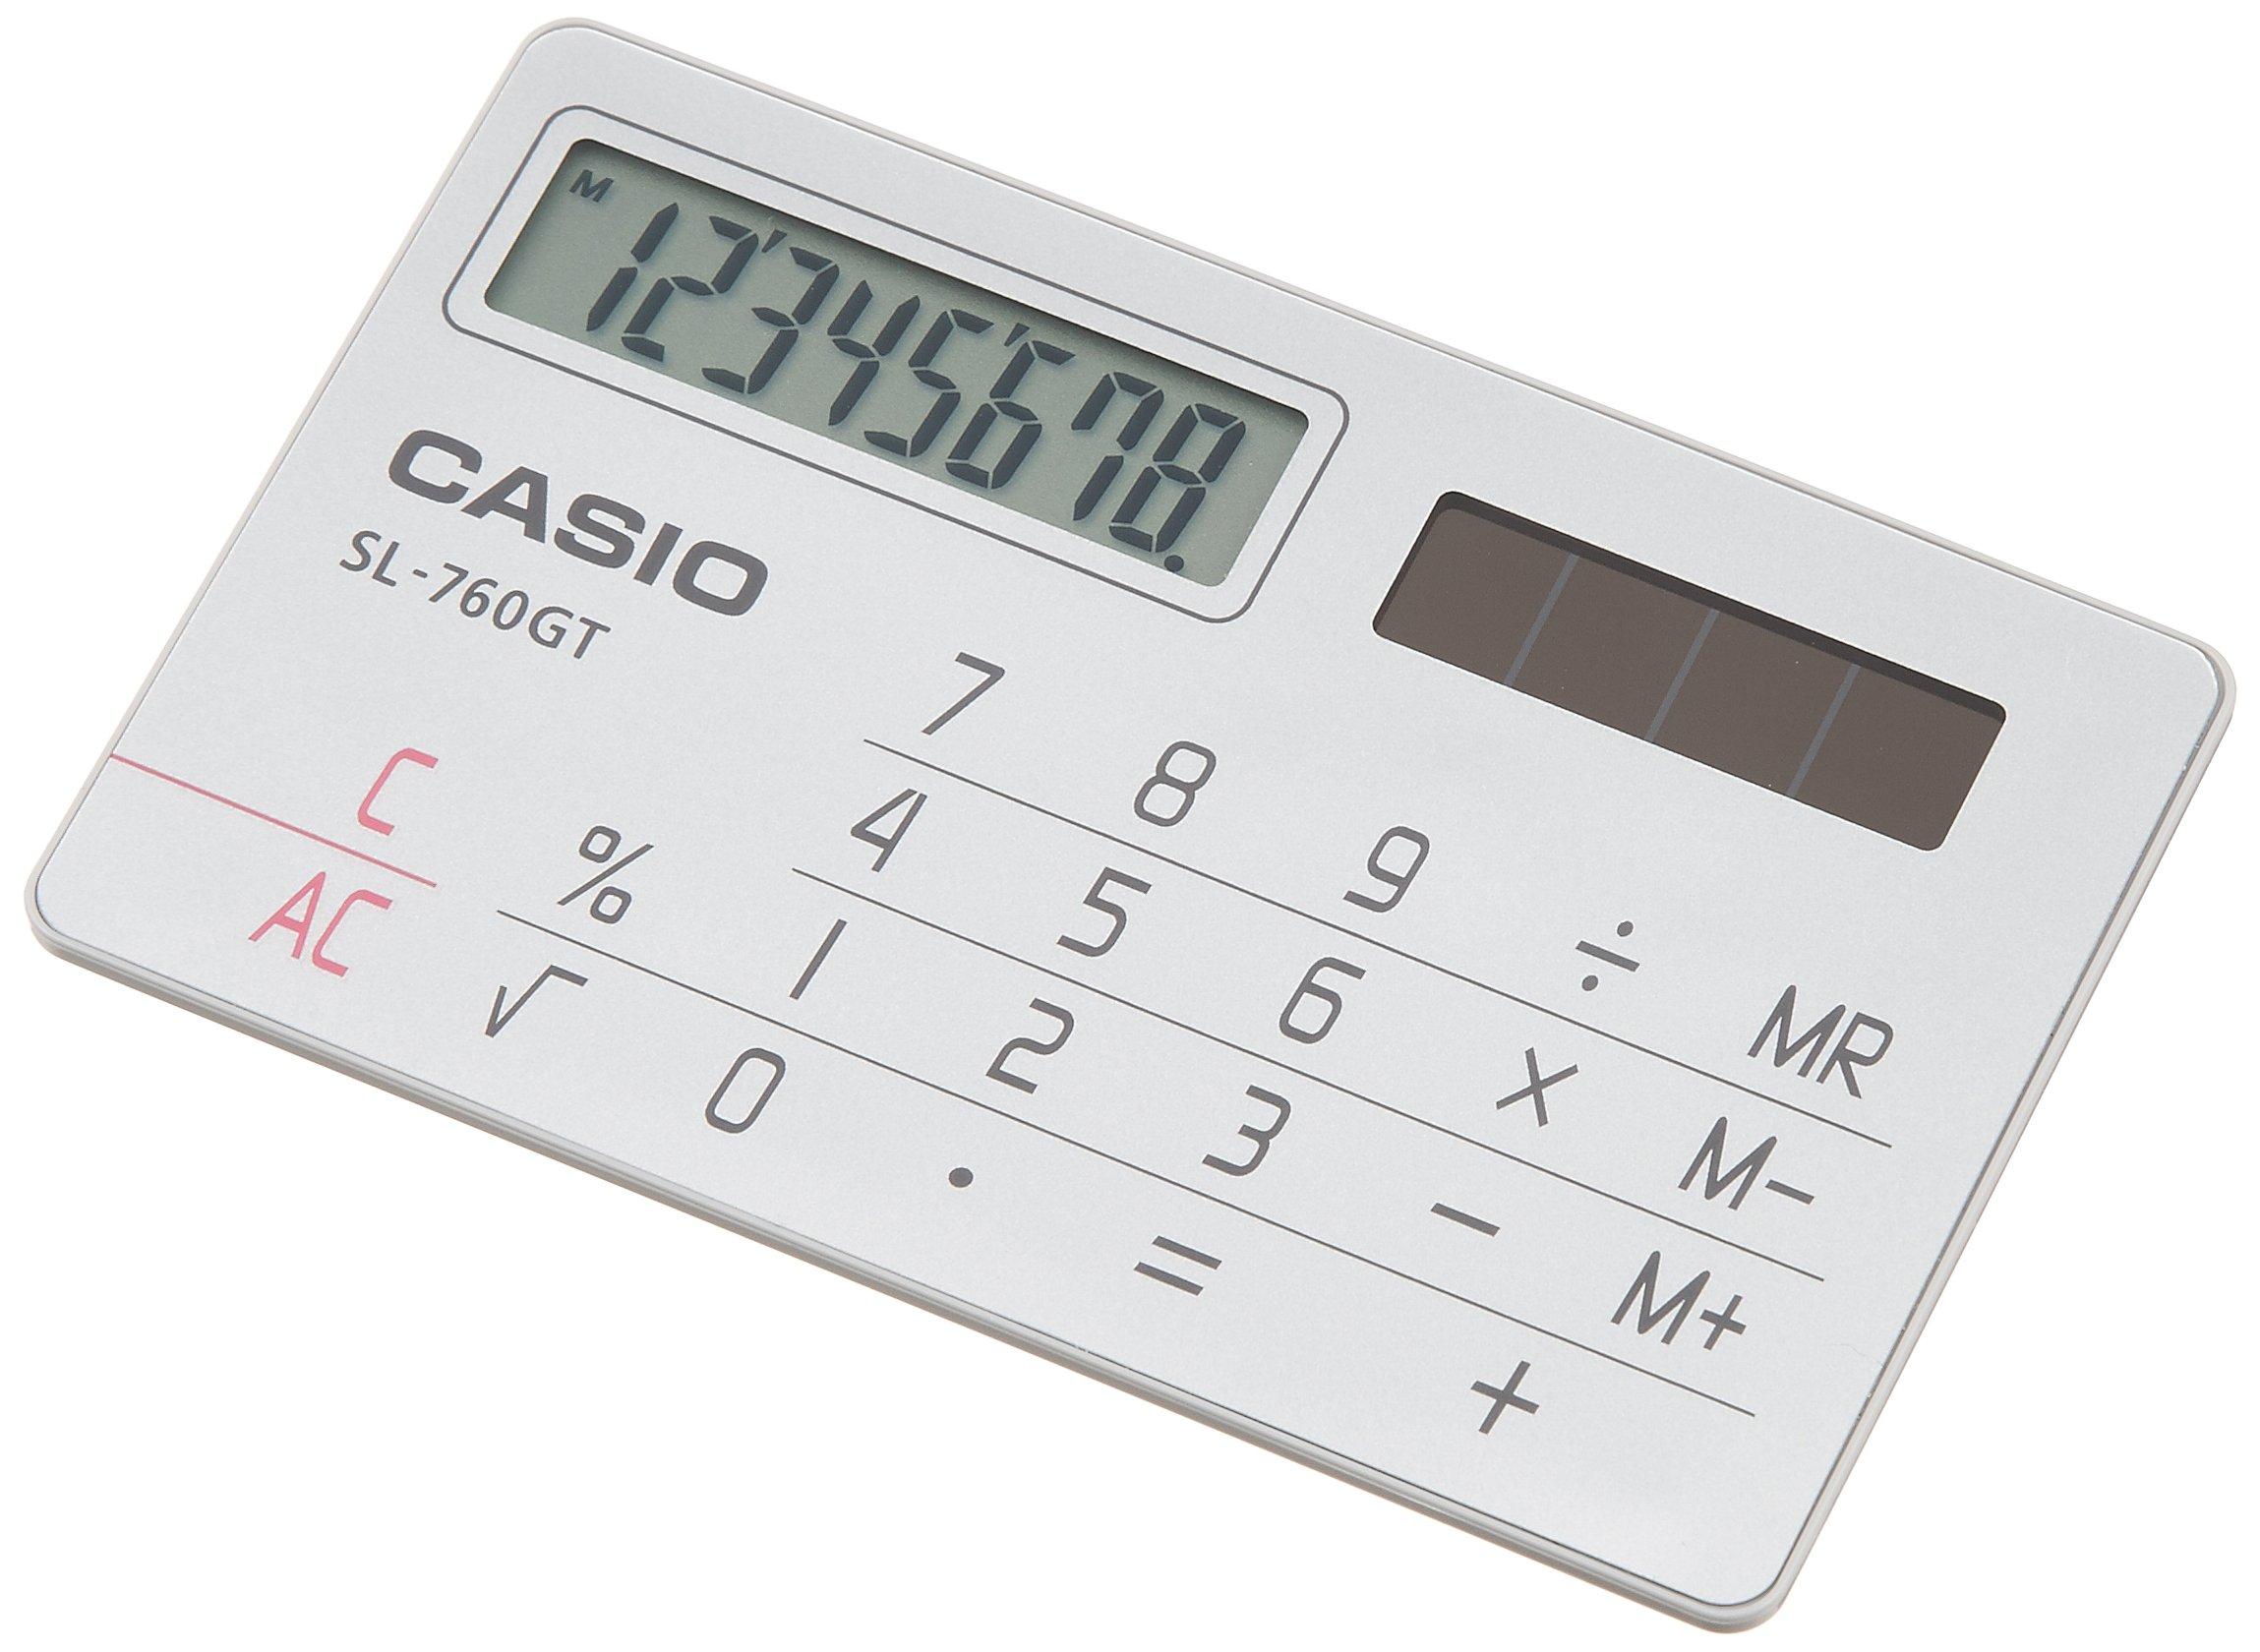 Casio Computer Co., Ltd. Casio card type calculator 8-digit SL-760GT-N (japan import)